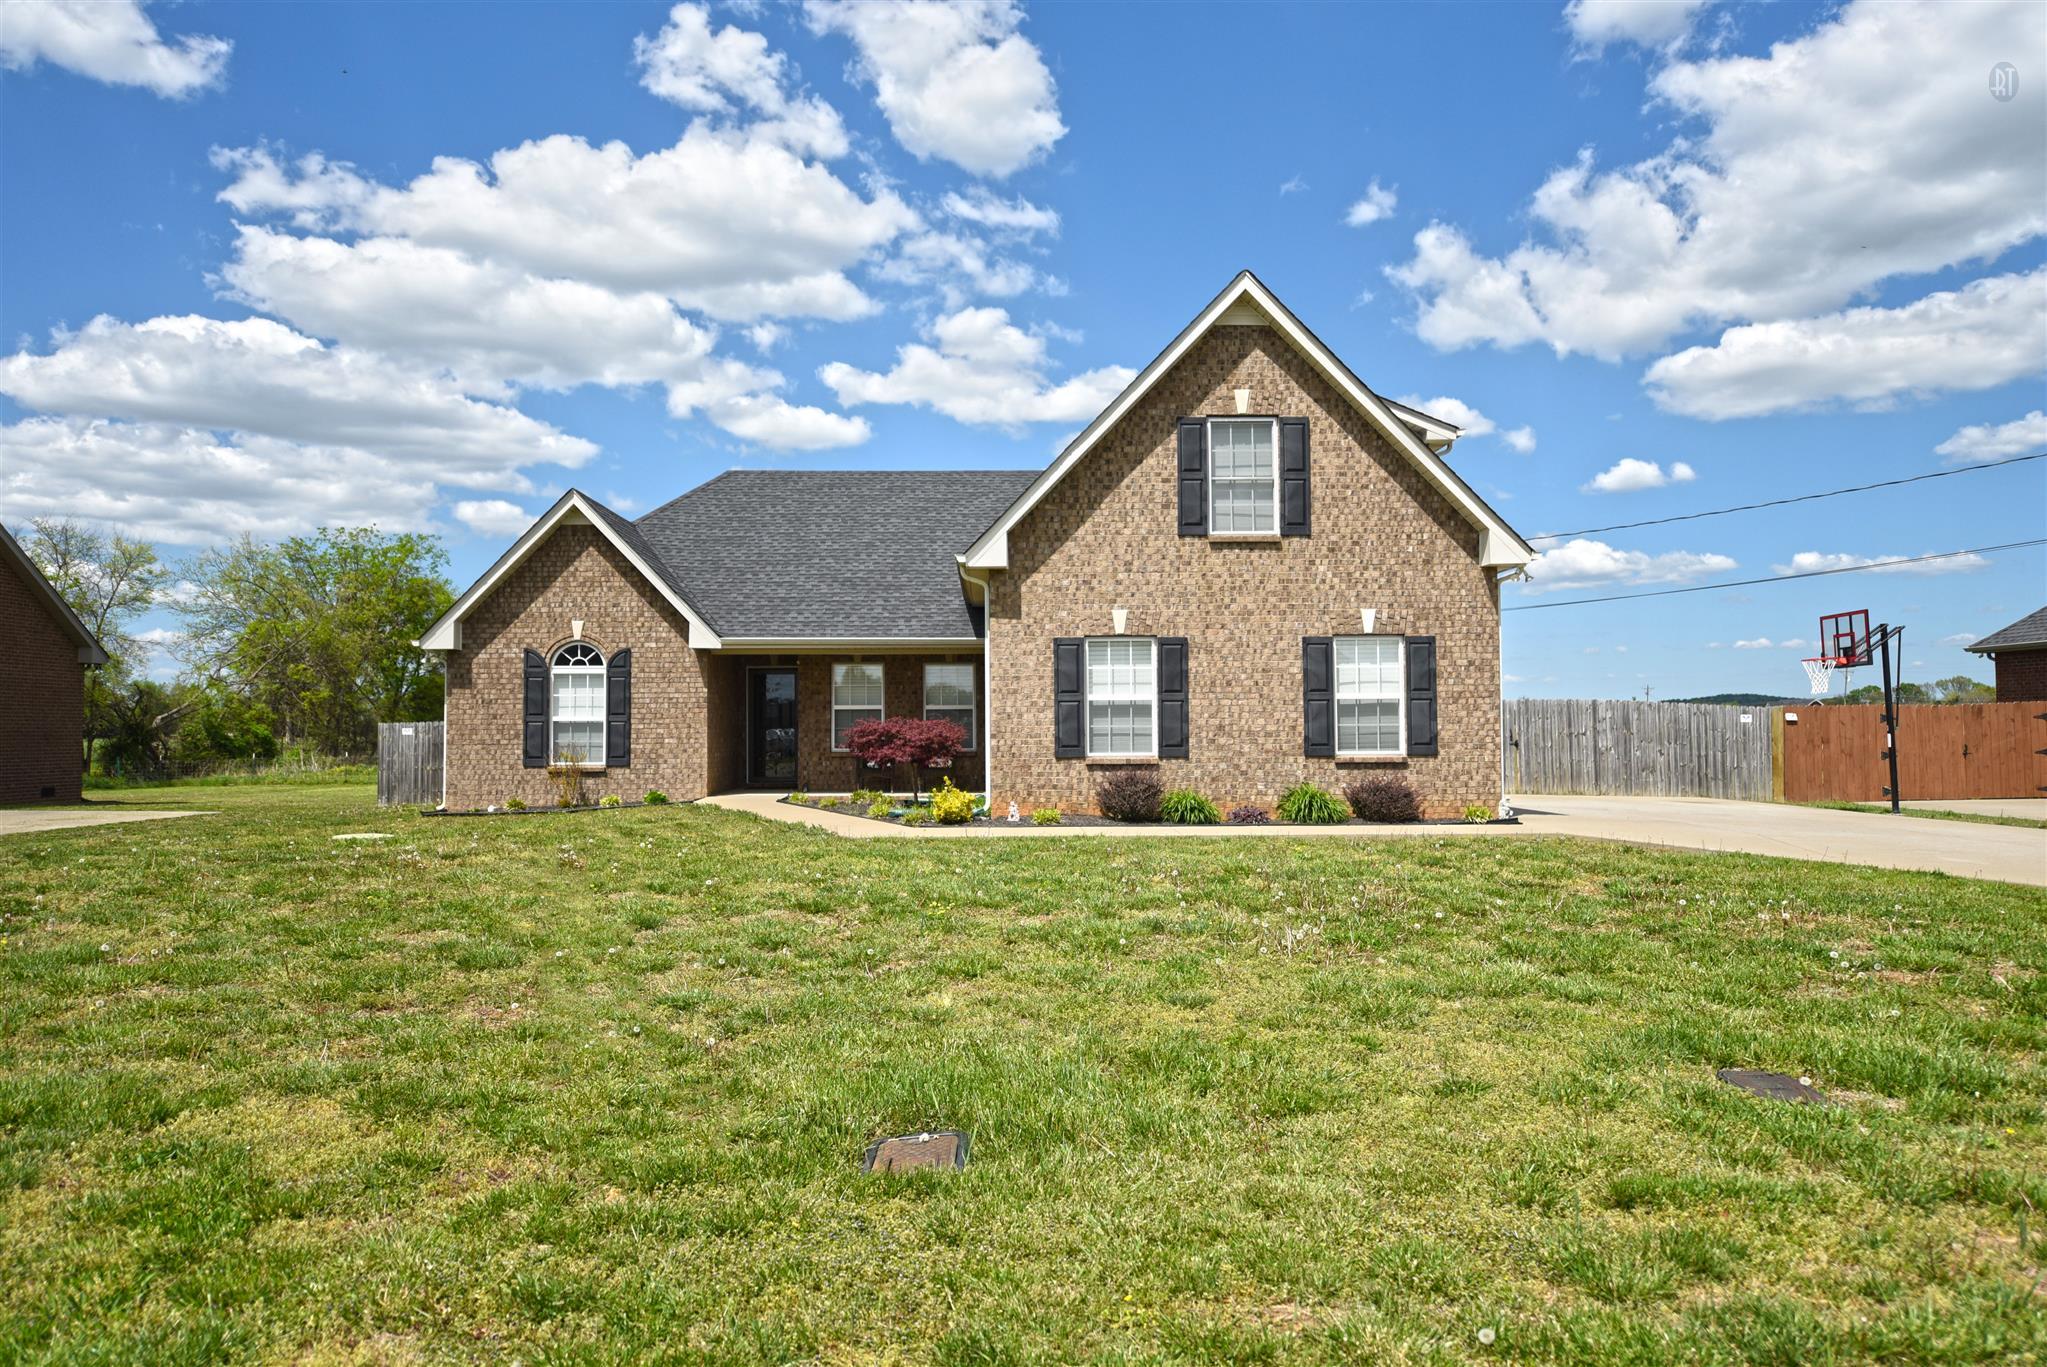 4849 Binder Ln, Murfreesboro, TN 37127